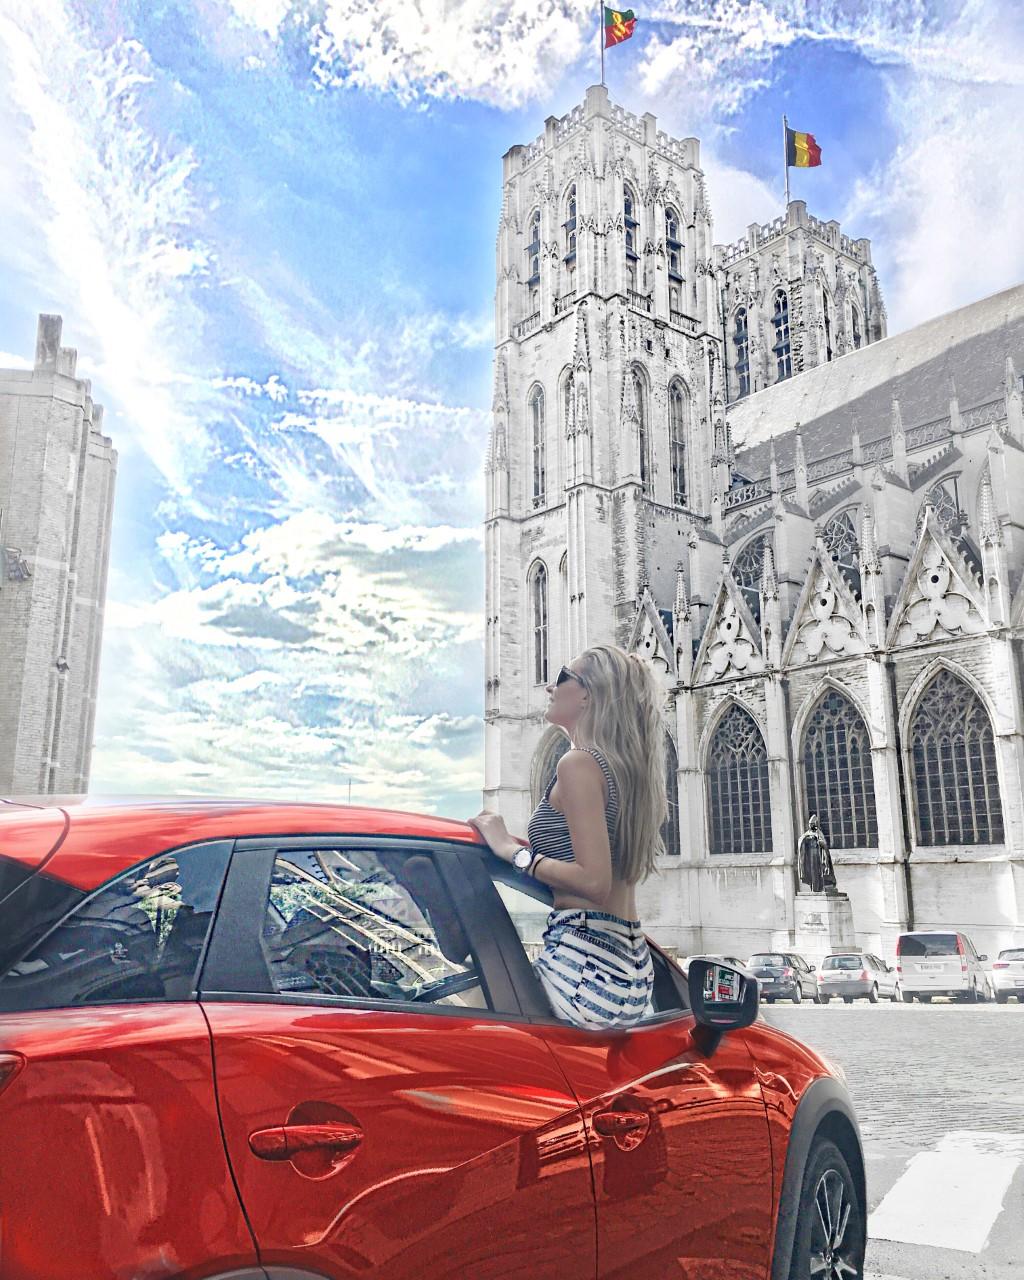 Mazda_CX3_Bymyheels_Tomorrowland_Lara_Martin_Gilarranz (5)